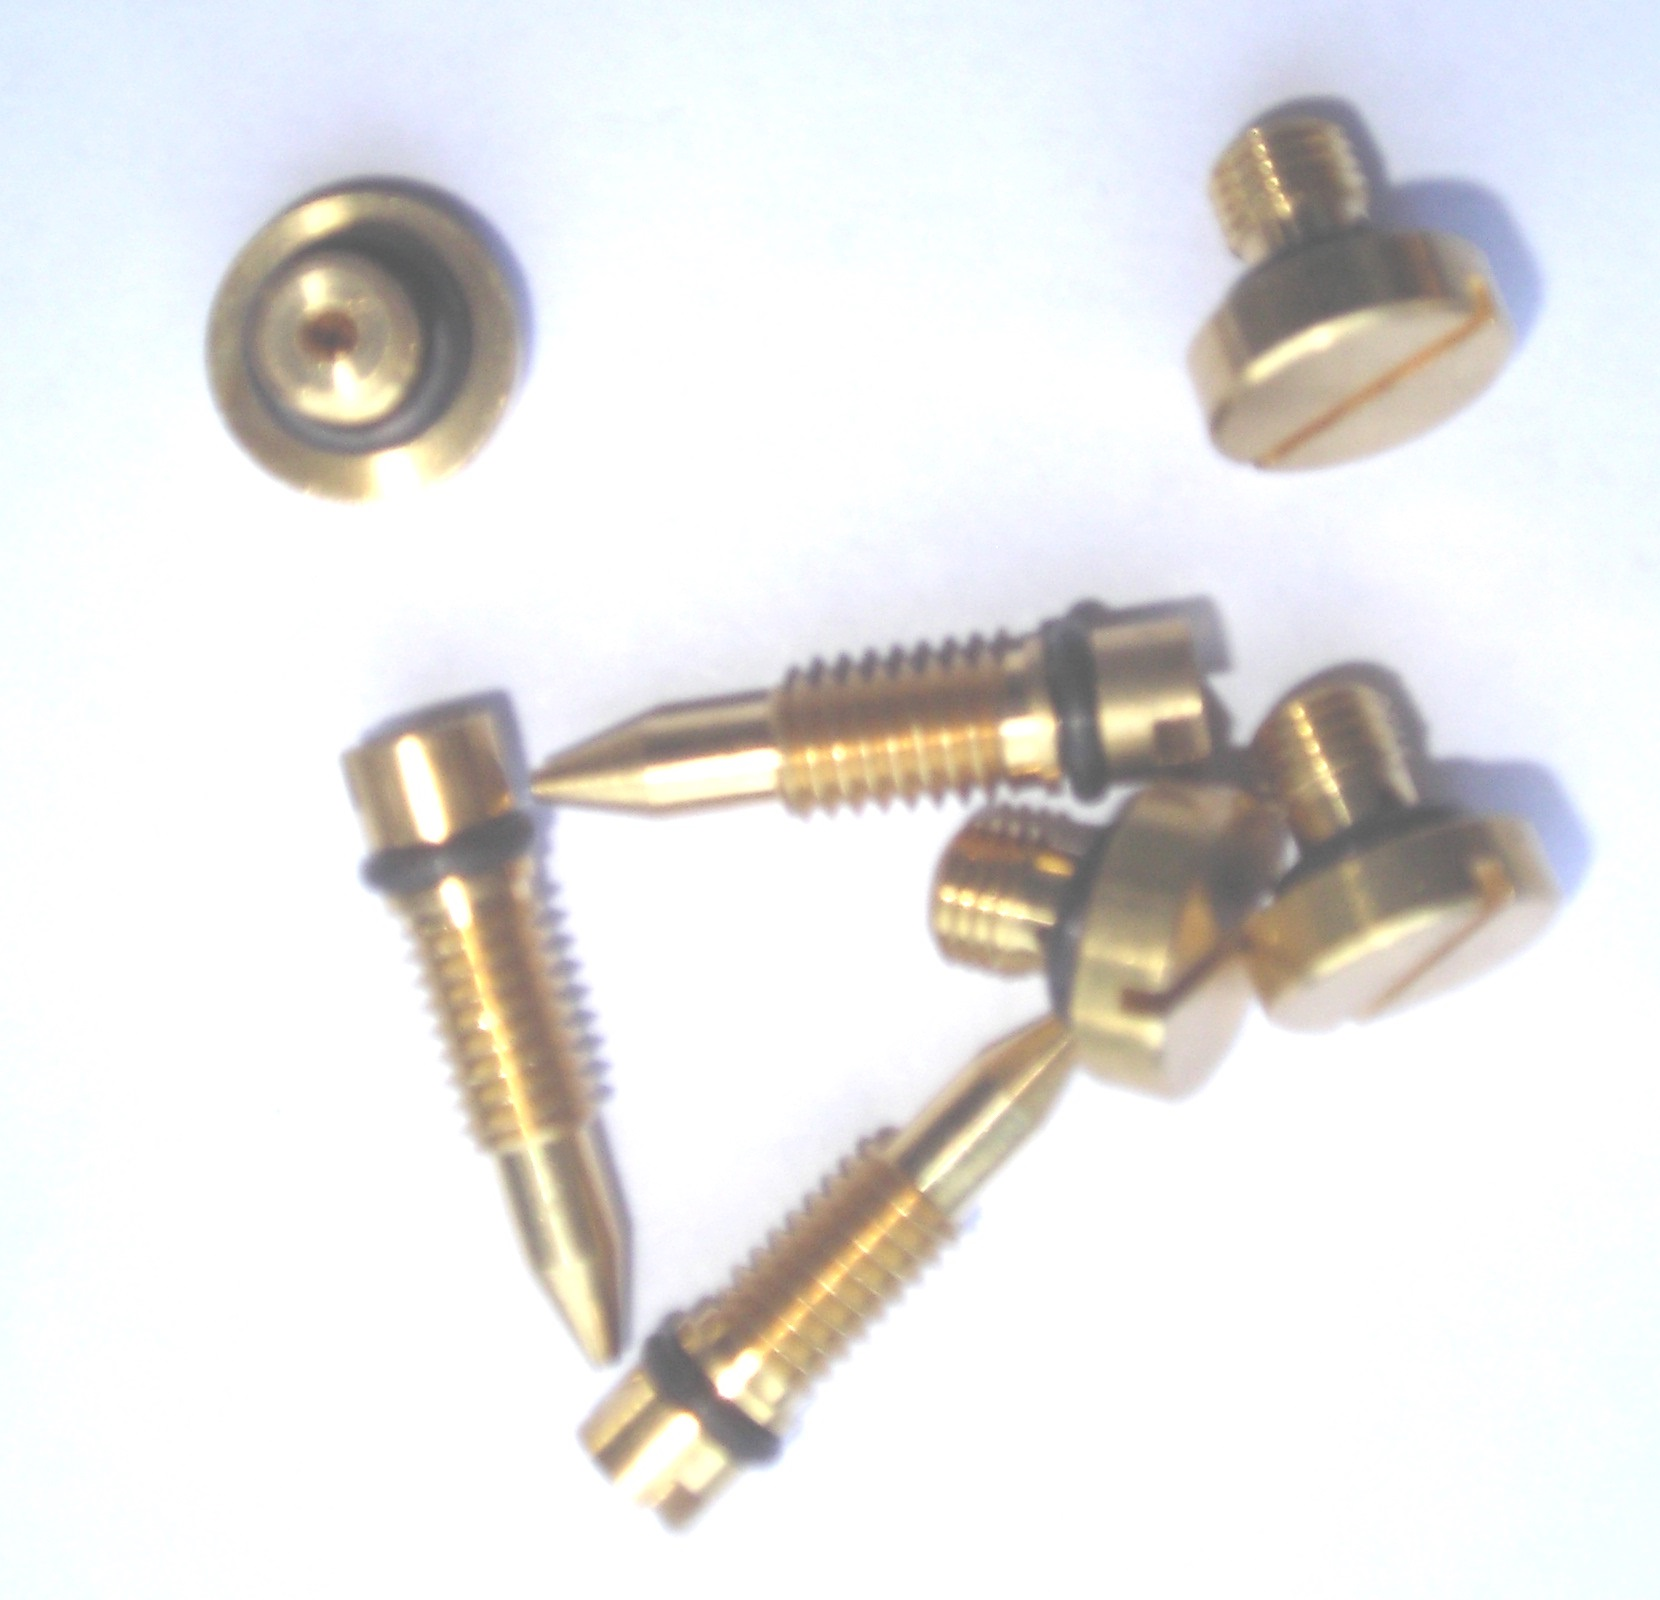 Carburation motokristen - Reglage carburateur a membrane ...